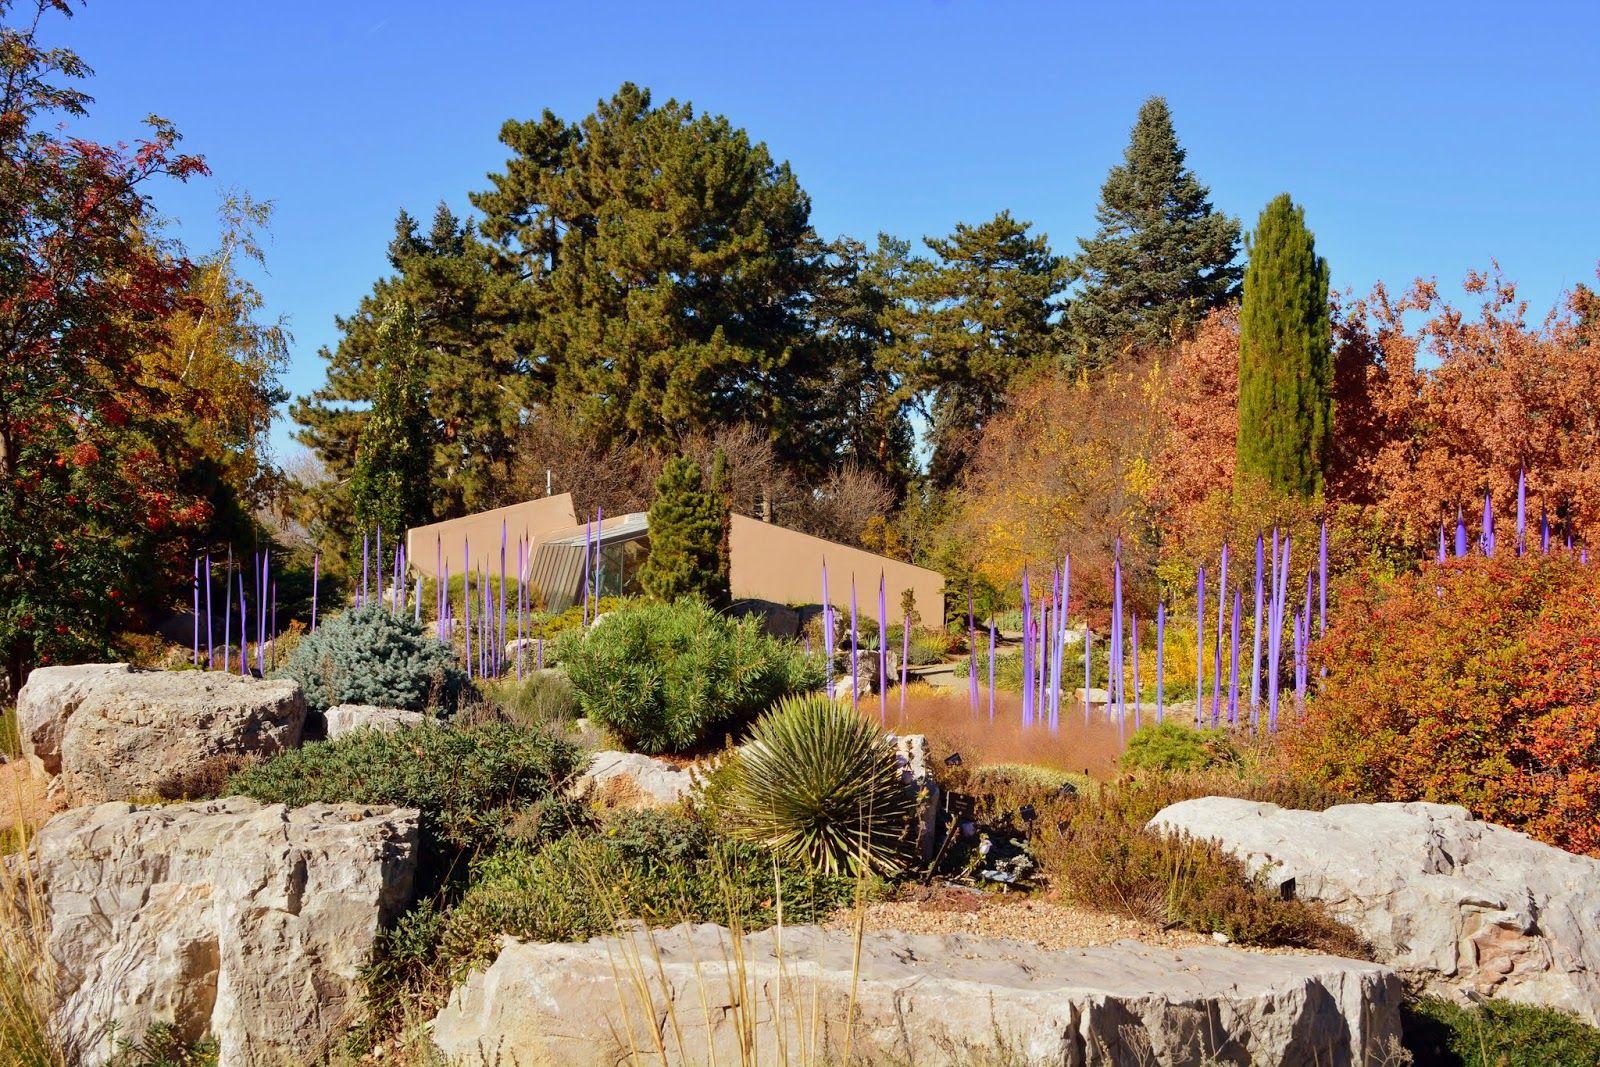 Mille Fiori Favoriti: Chihuly Exhibit at the Denver Botanic Garden ...